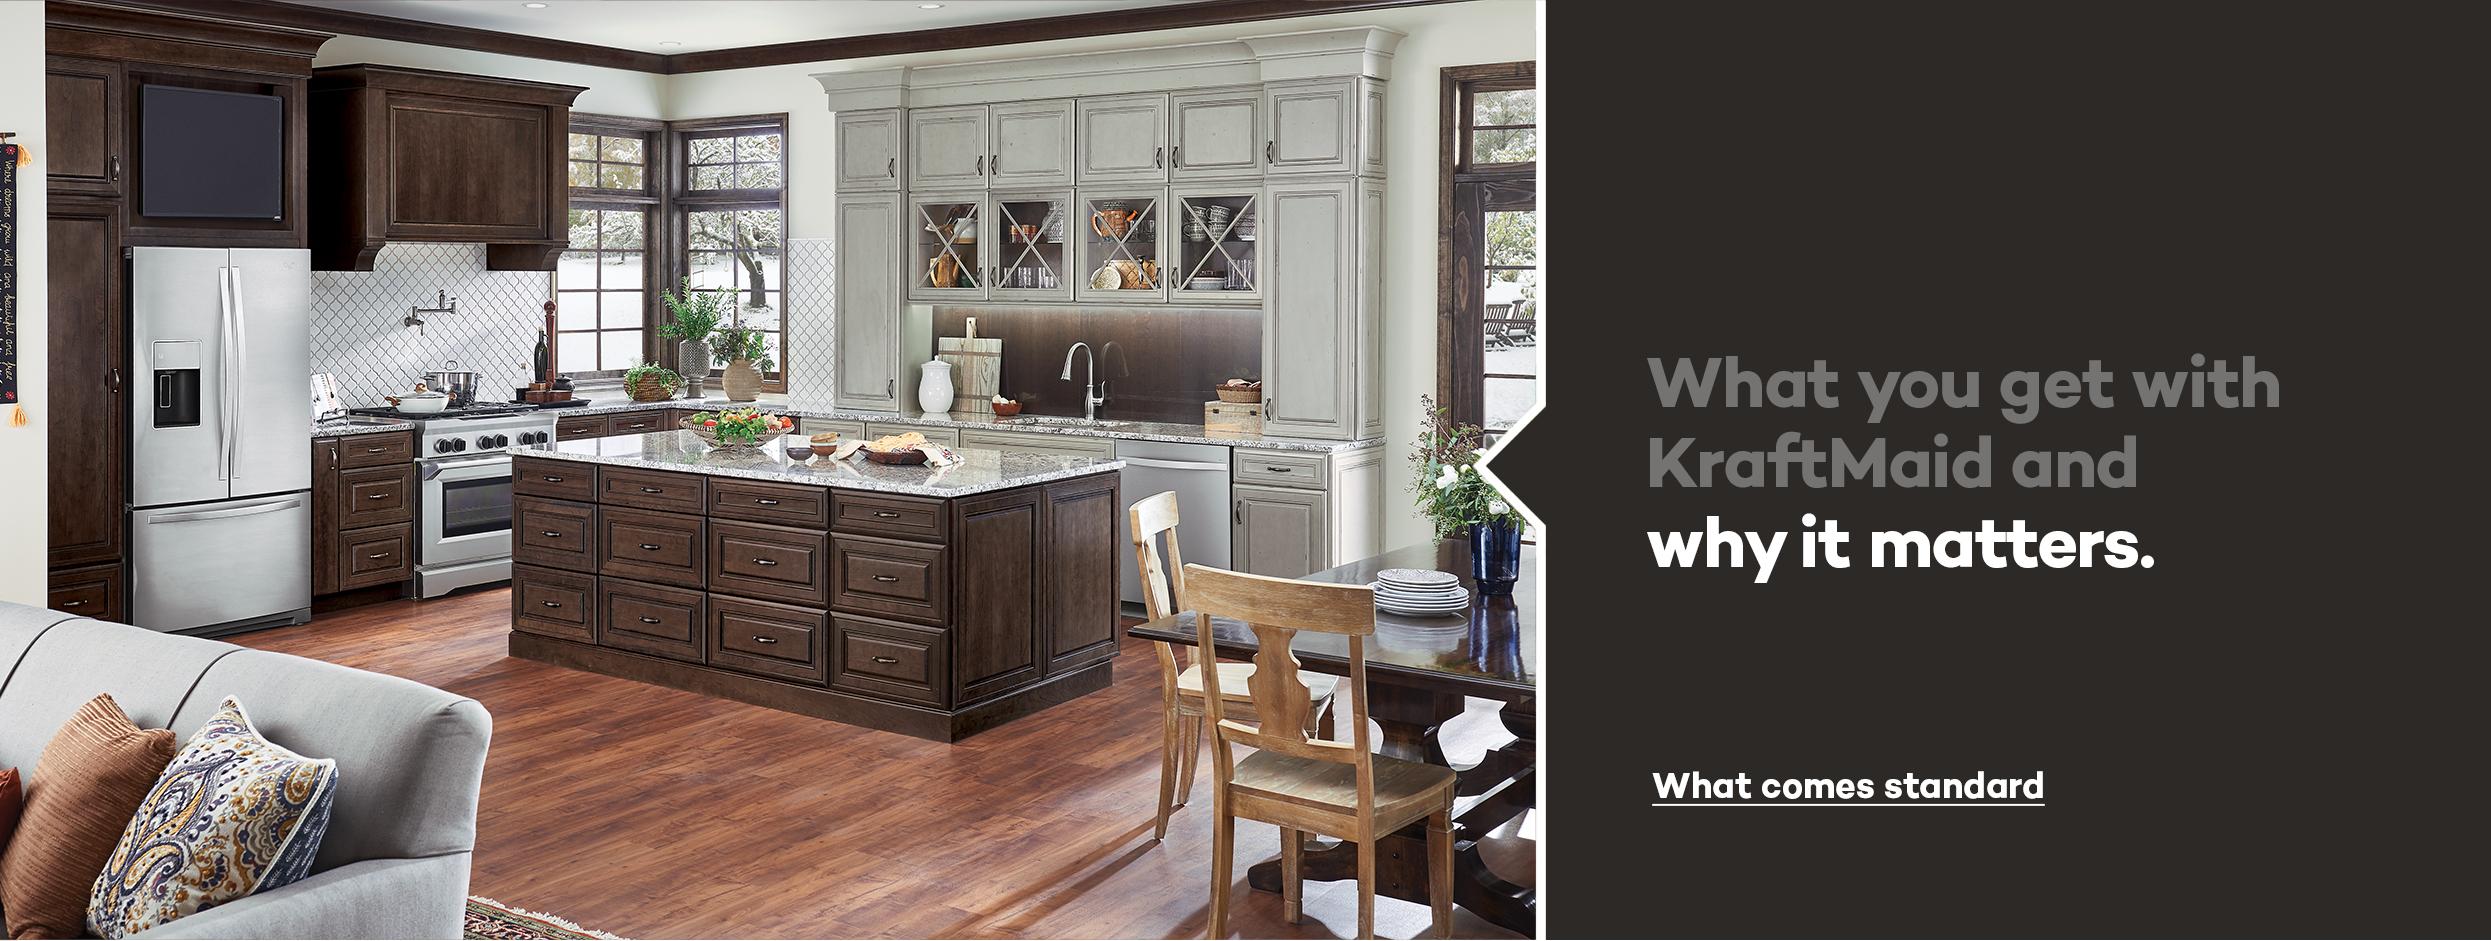 KraftMaid Beautiful cabinets for kitchen & bathroom designs